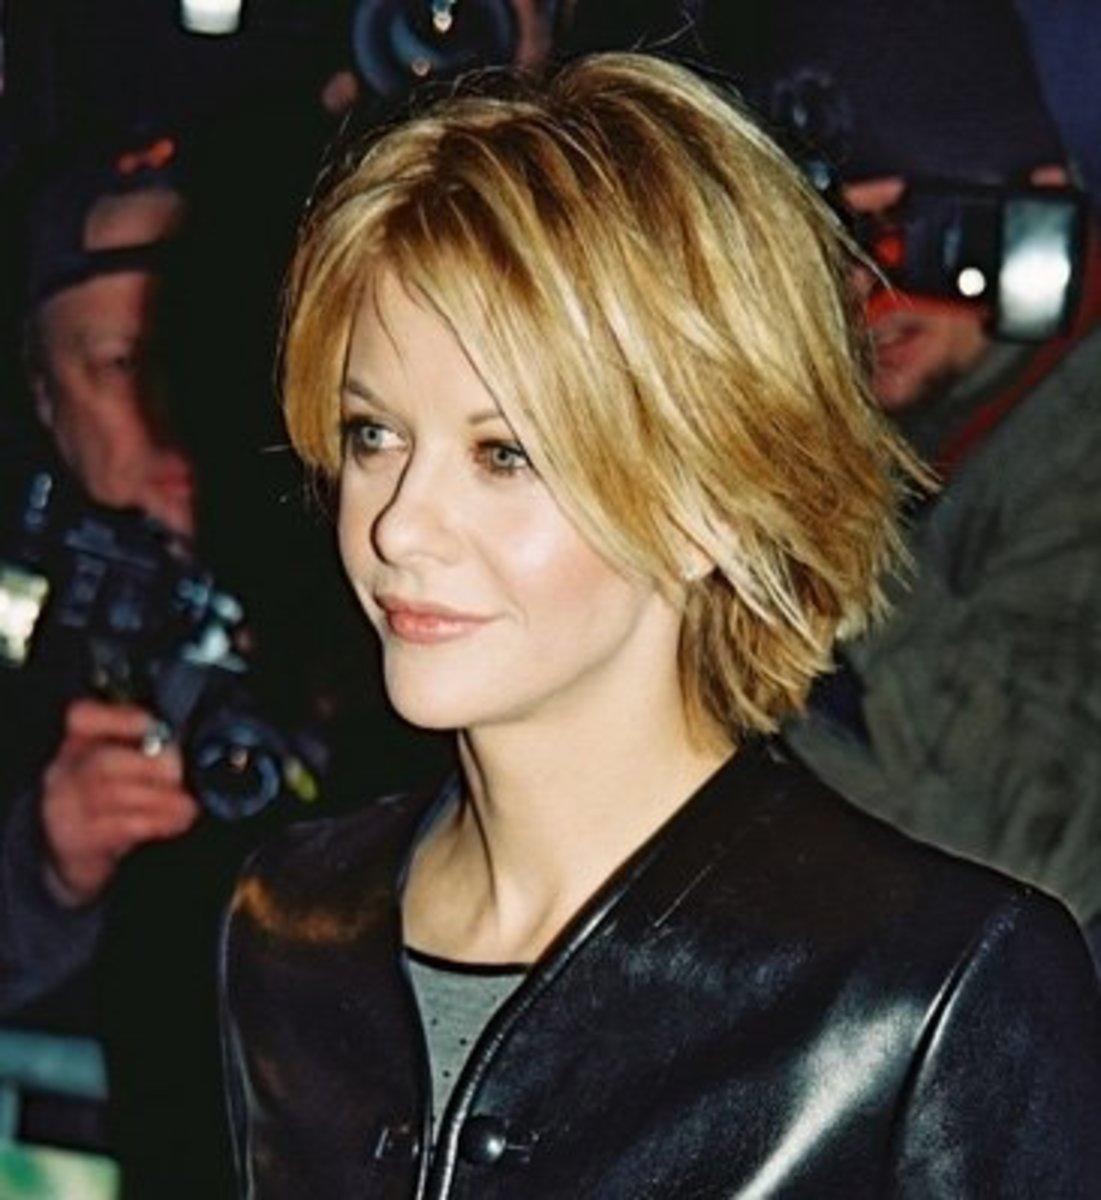 popular blonde colored celebrity short sedu hair cut